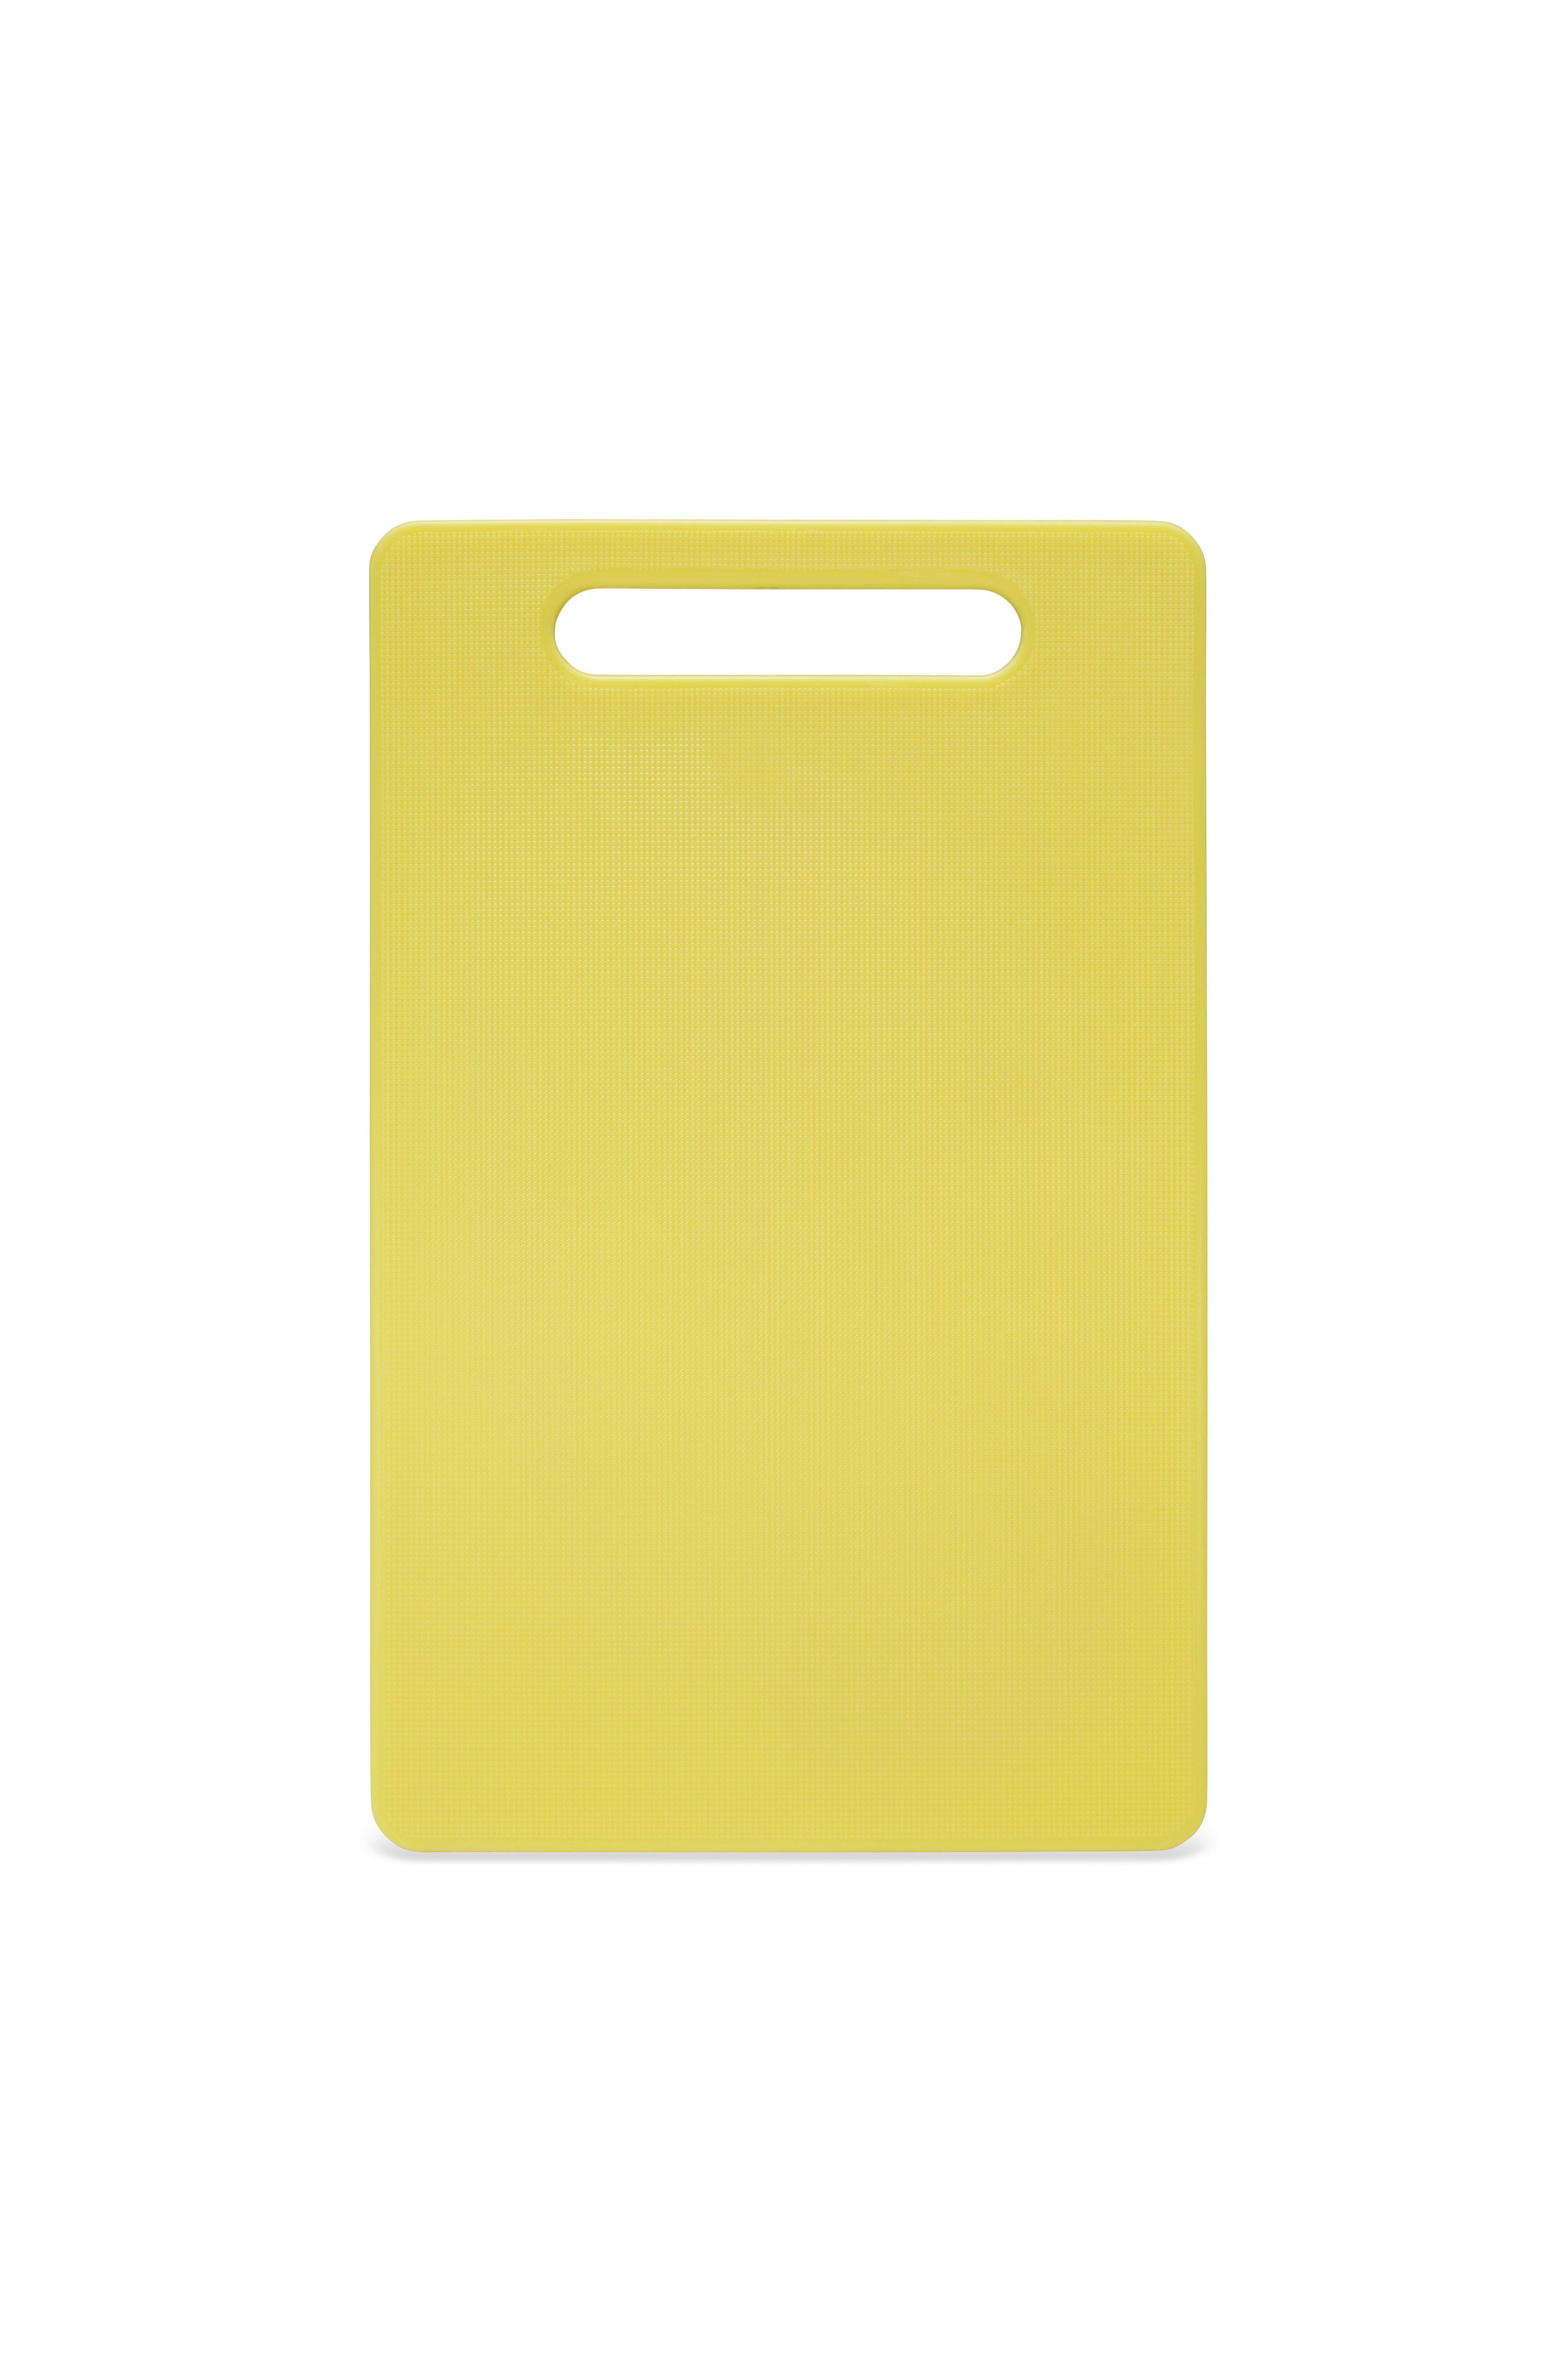 SCHNEIDEBRETT 15/24/0,5 cm - Gelb, Basics, Kunststoff (15/24/0,5cm) - HOMEWARE